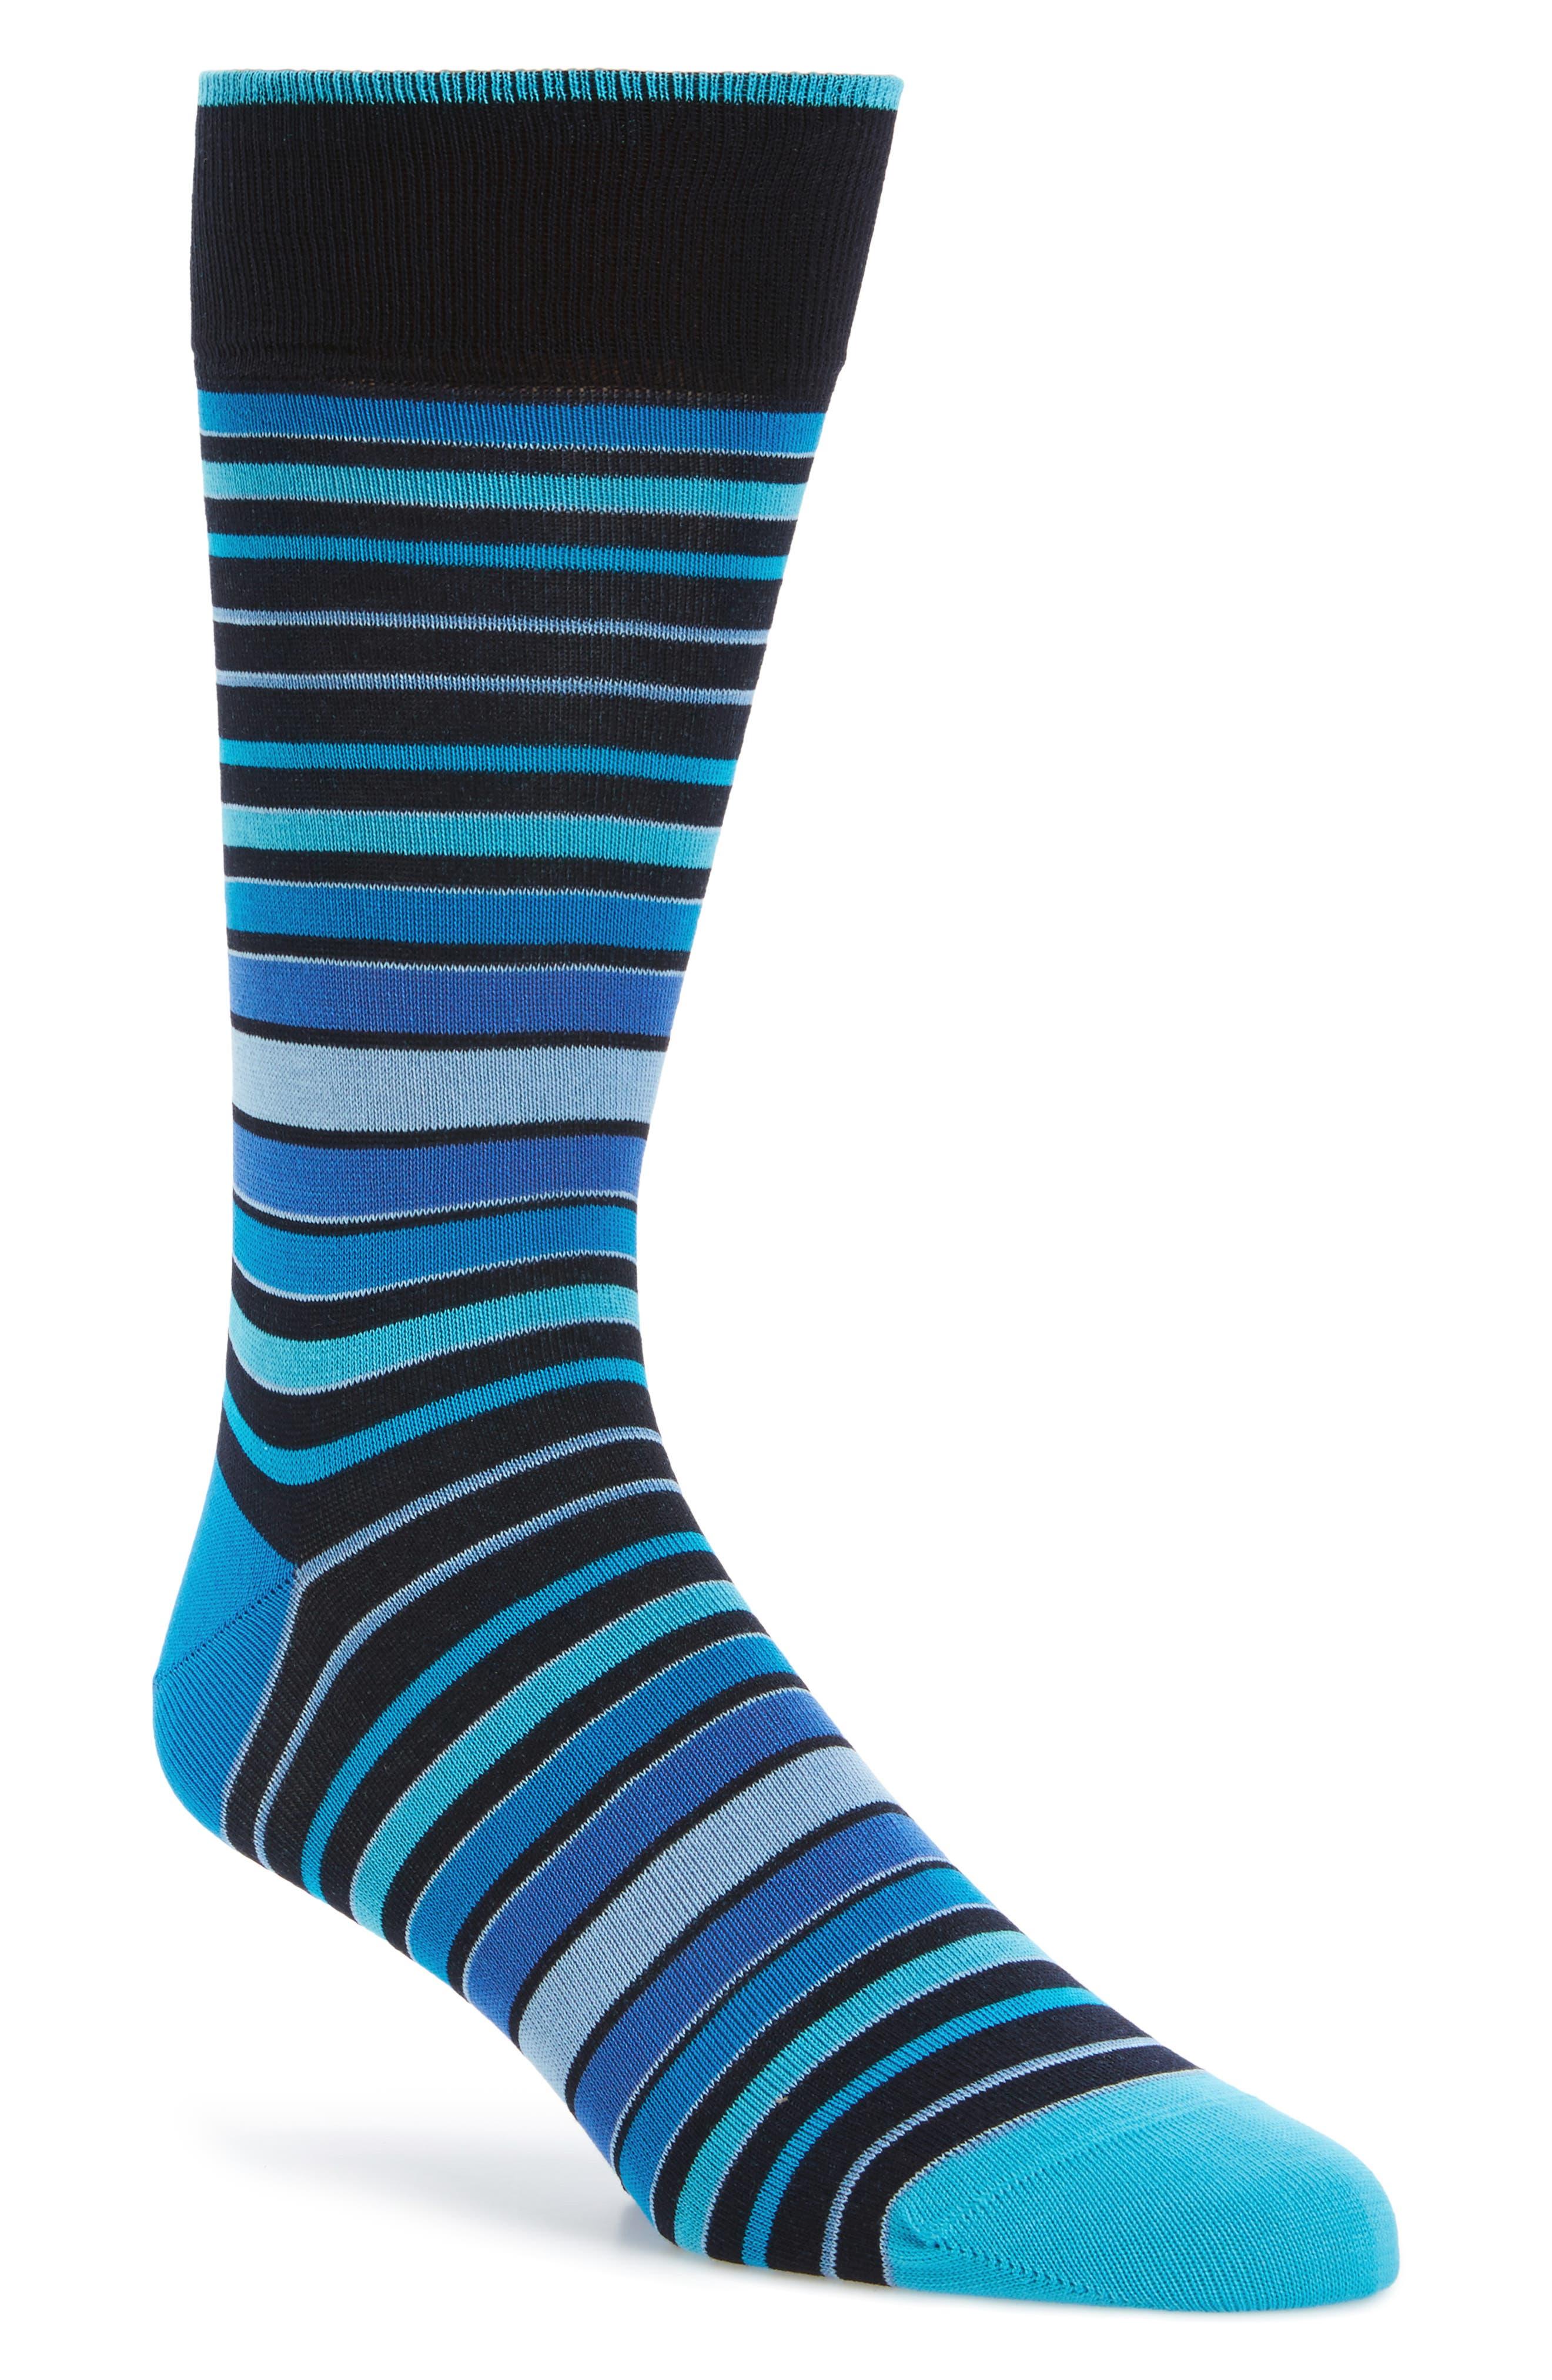 Alternate Image 1 Selected - Bugatchi Thick Stripe Crew Socks